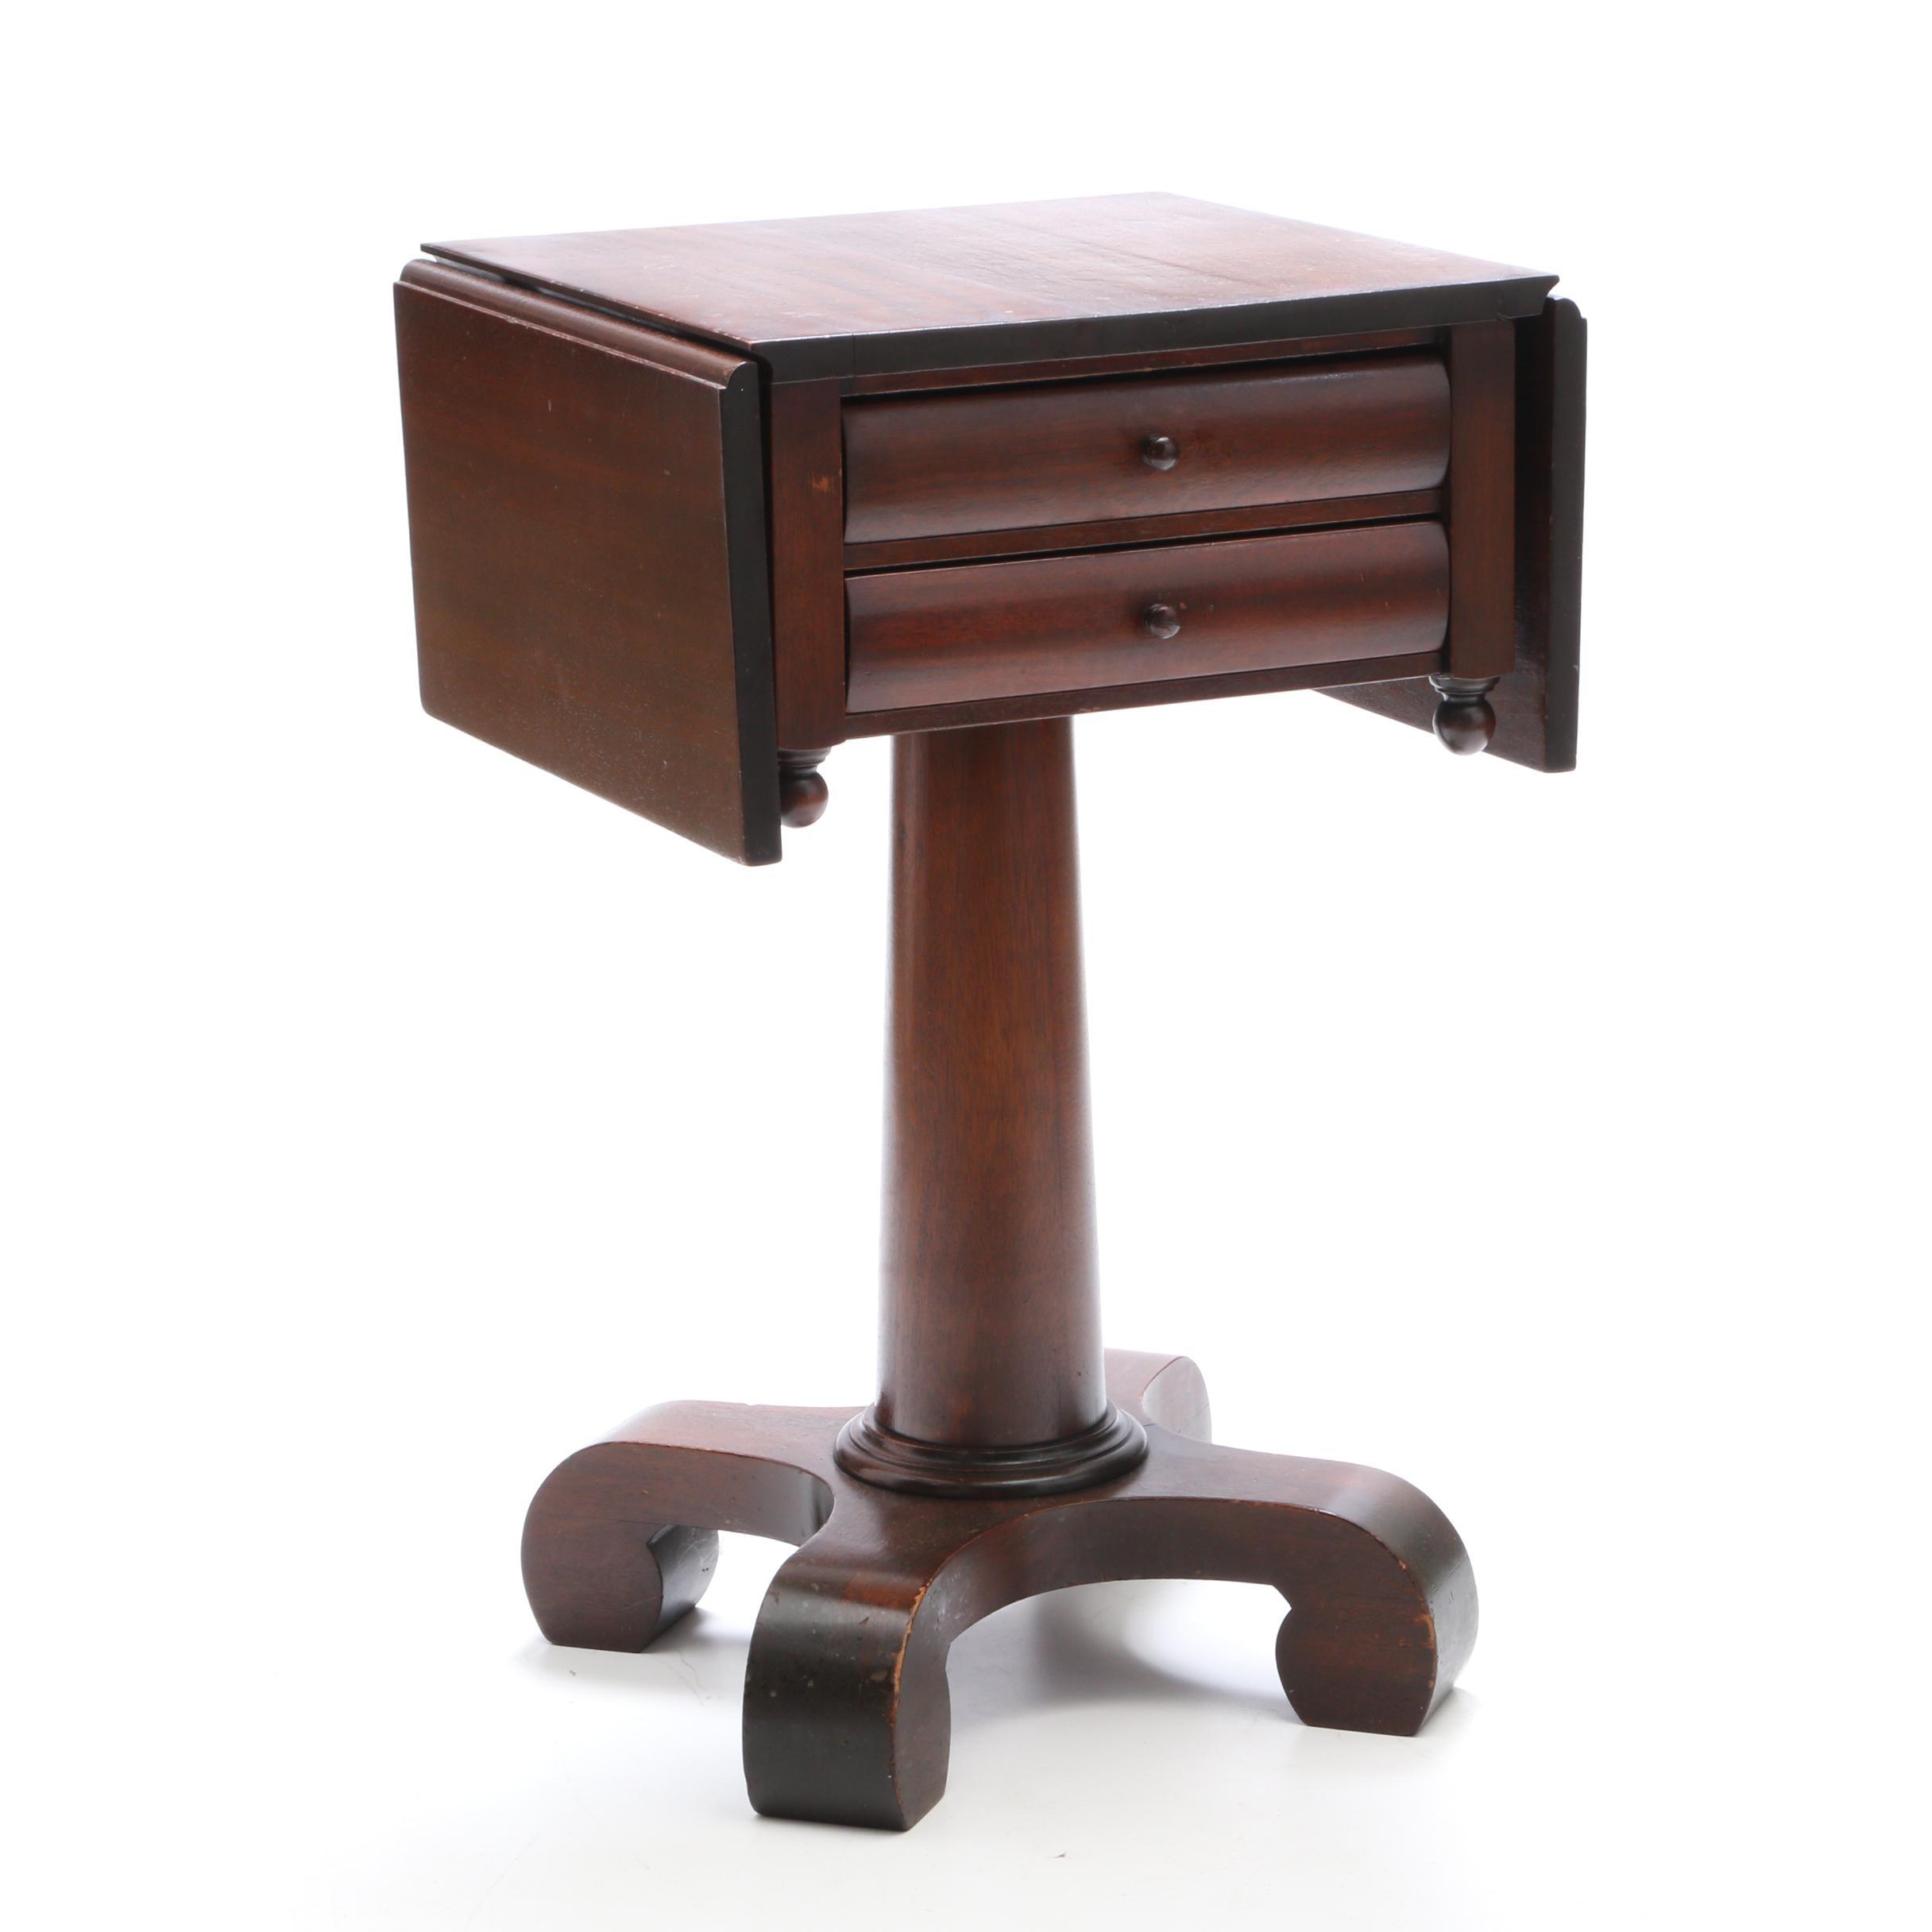 Vintage Drop Leaf Side Table by The Robert Mitchell Furniture Cincinnati